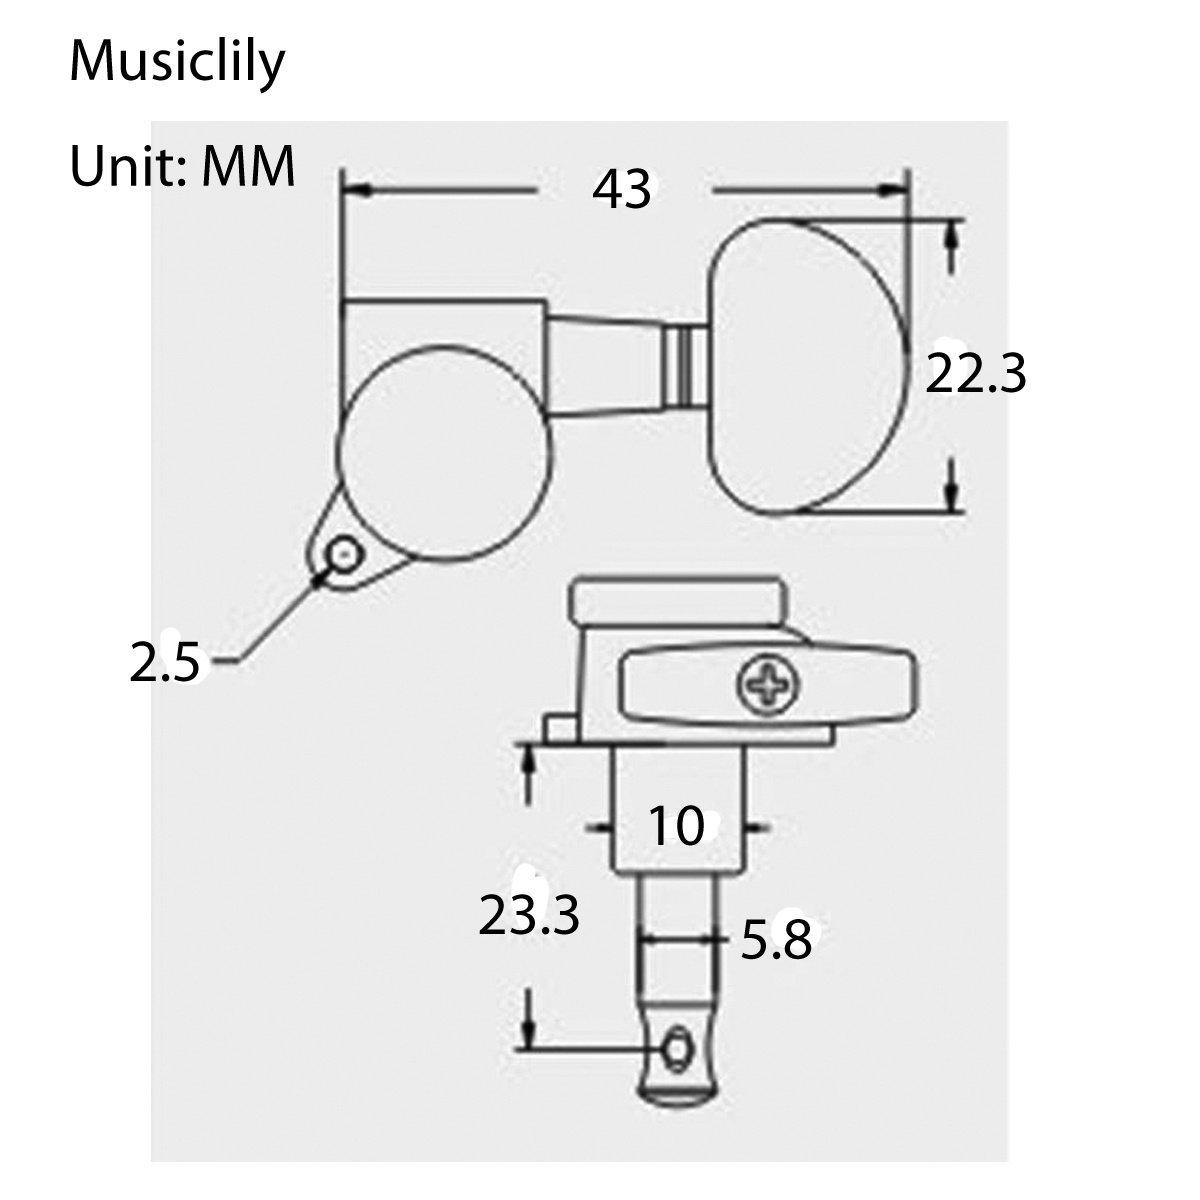 Musiclily 3+3 Guitar Locking Tuners Tuning Keys Pegs Machine Head Set Guitar Parts, Half Moon Button Black